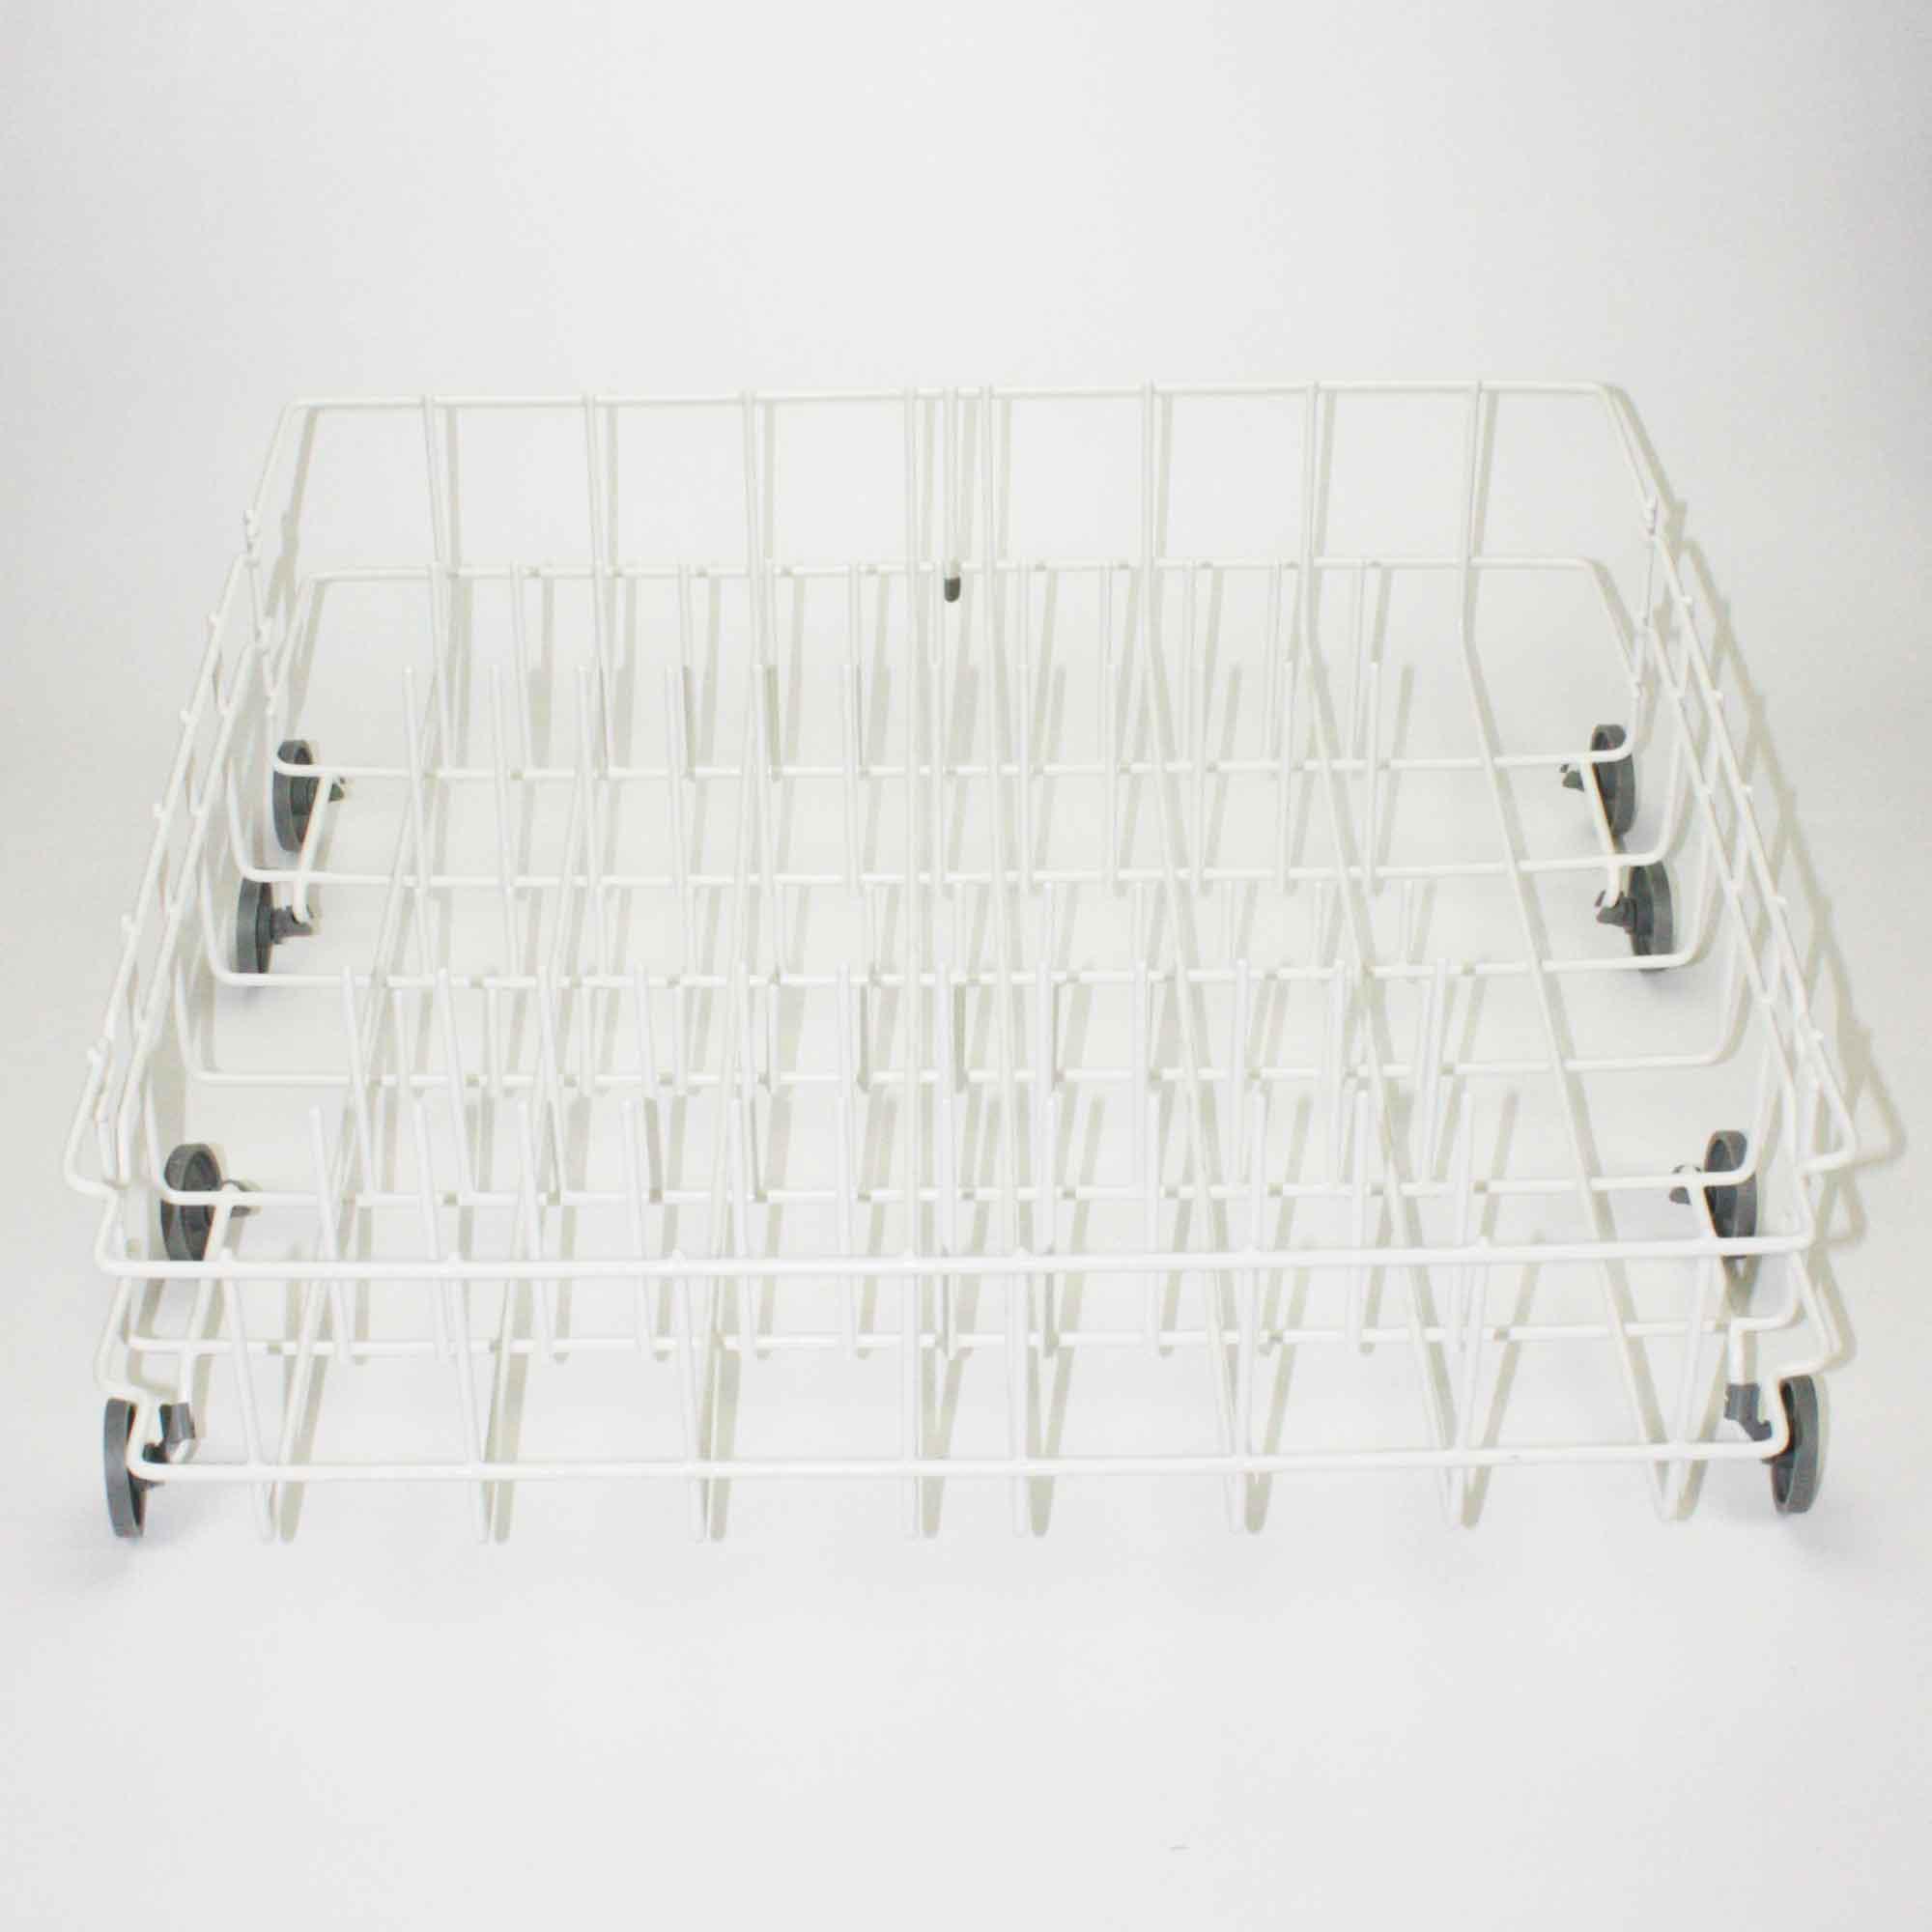 154331605 For Frigidaire Dishwasher Lower Dishrack by Frigidaire